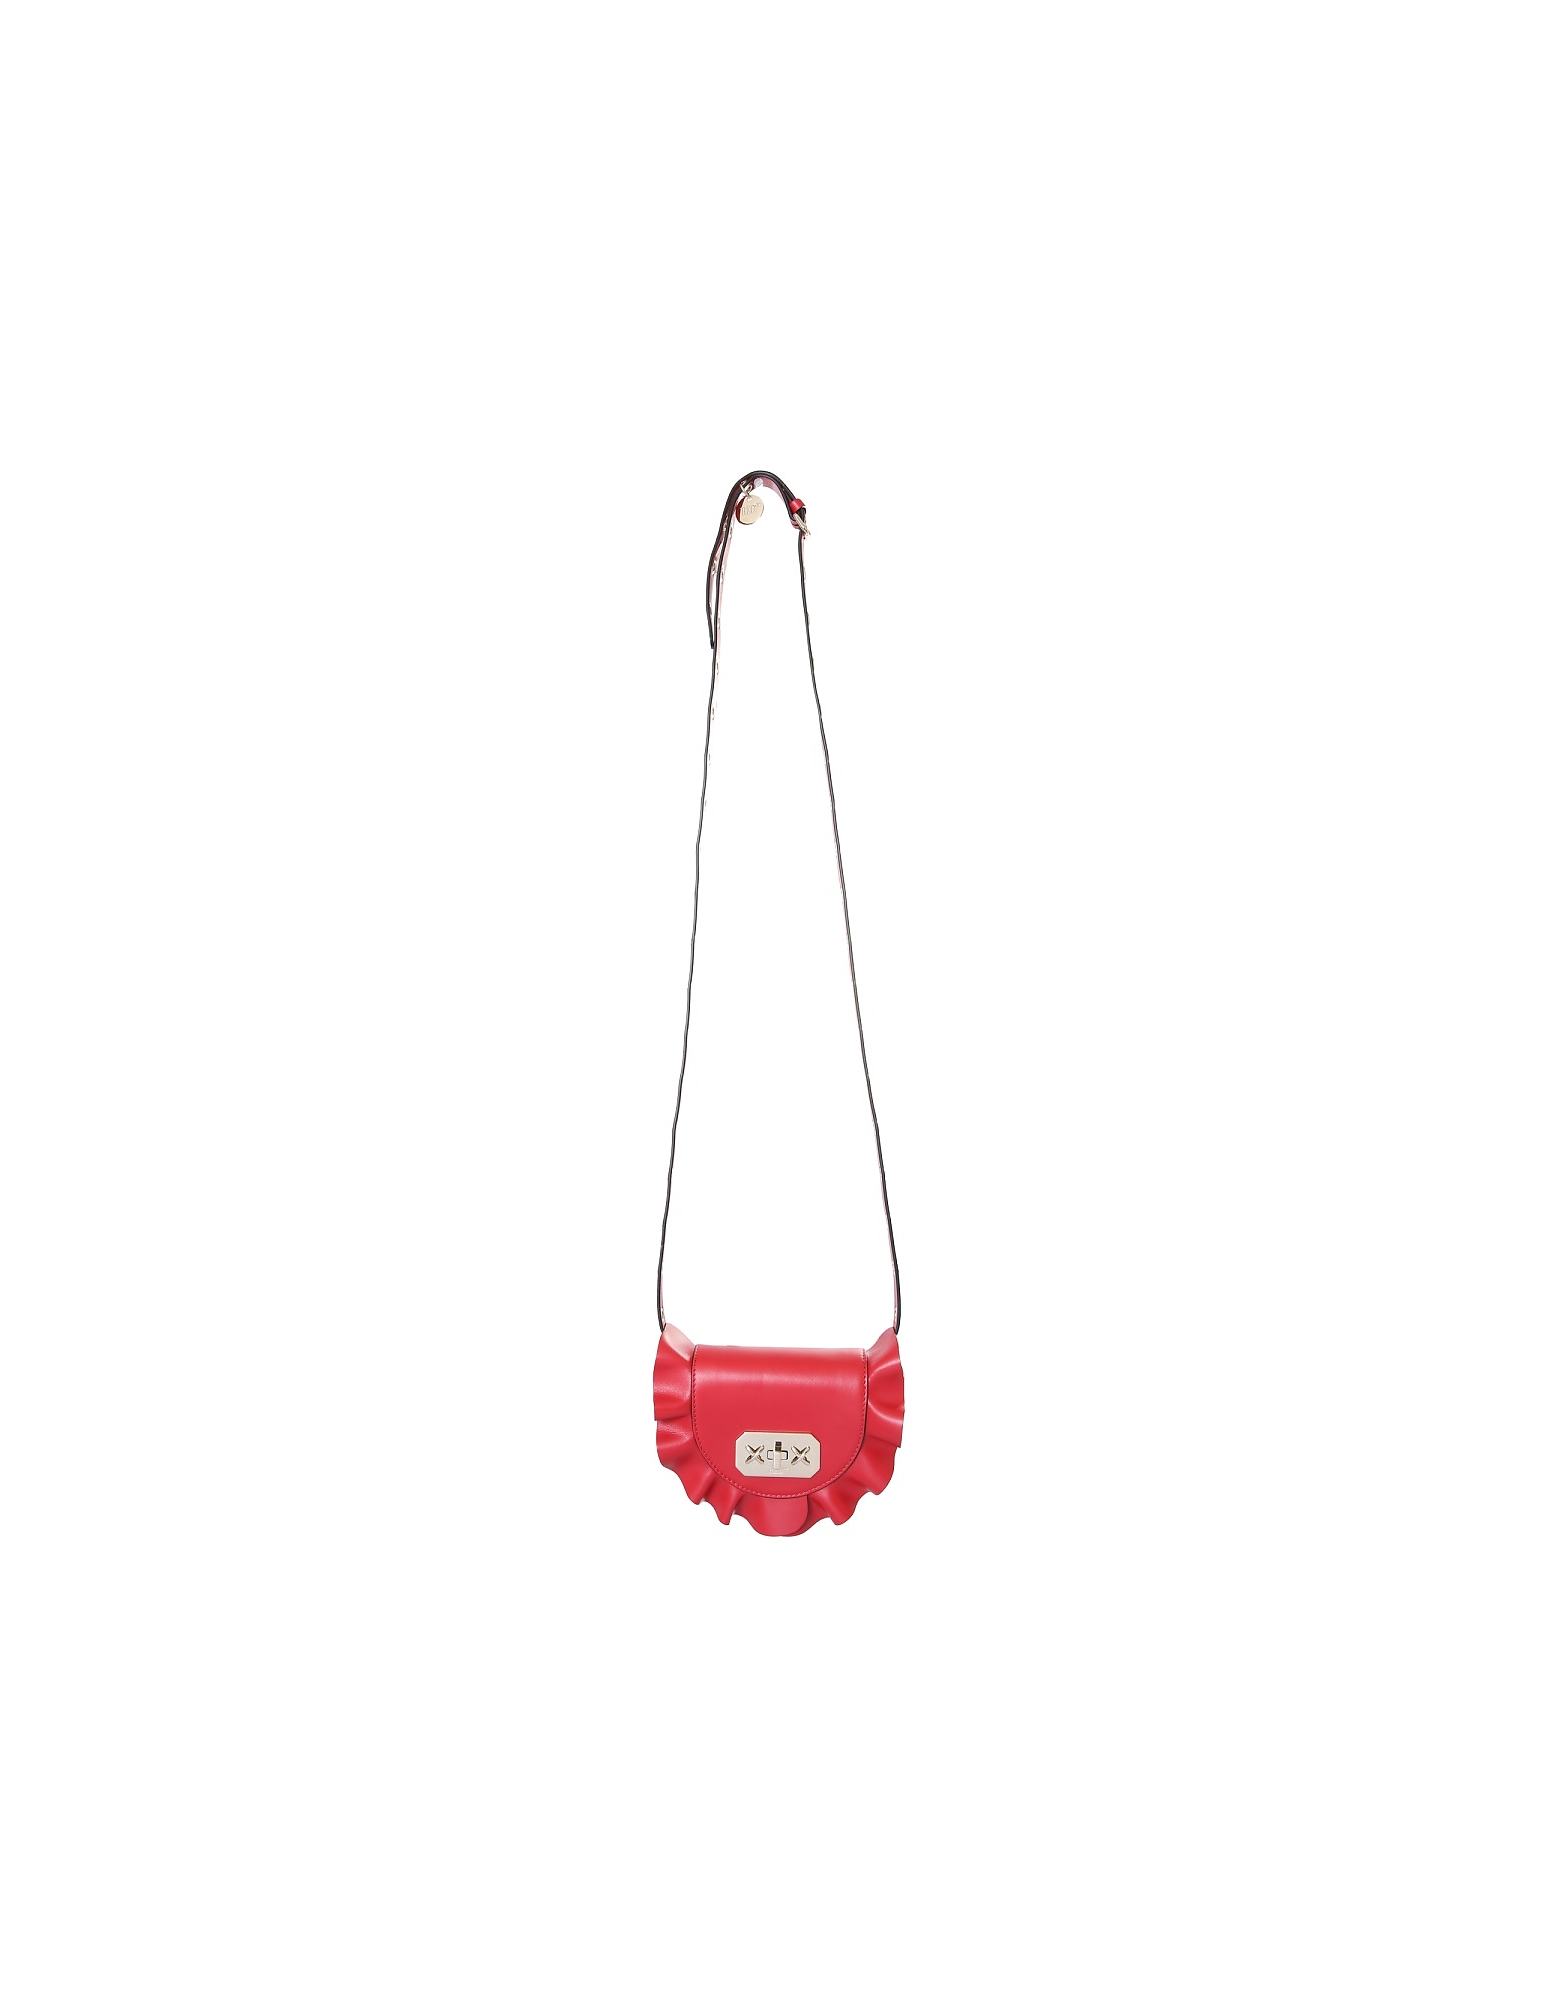 RED Valentino Designer Handbags, Rock Ruffles Red Leather Crossbody/Belt Bag